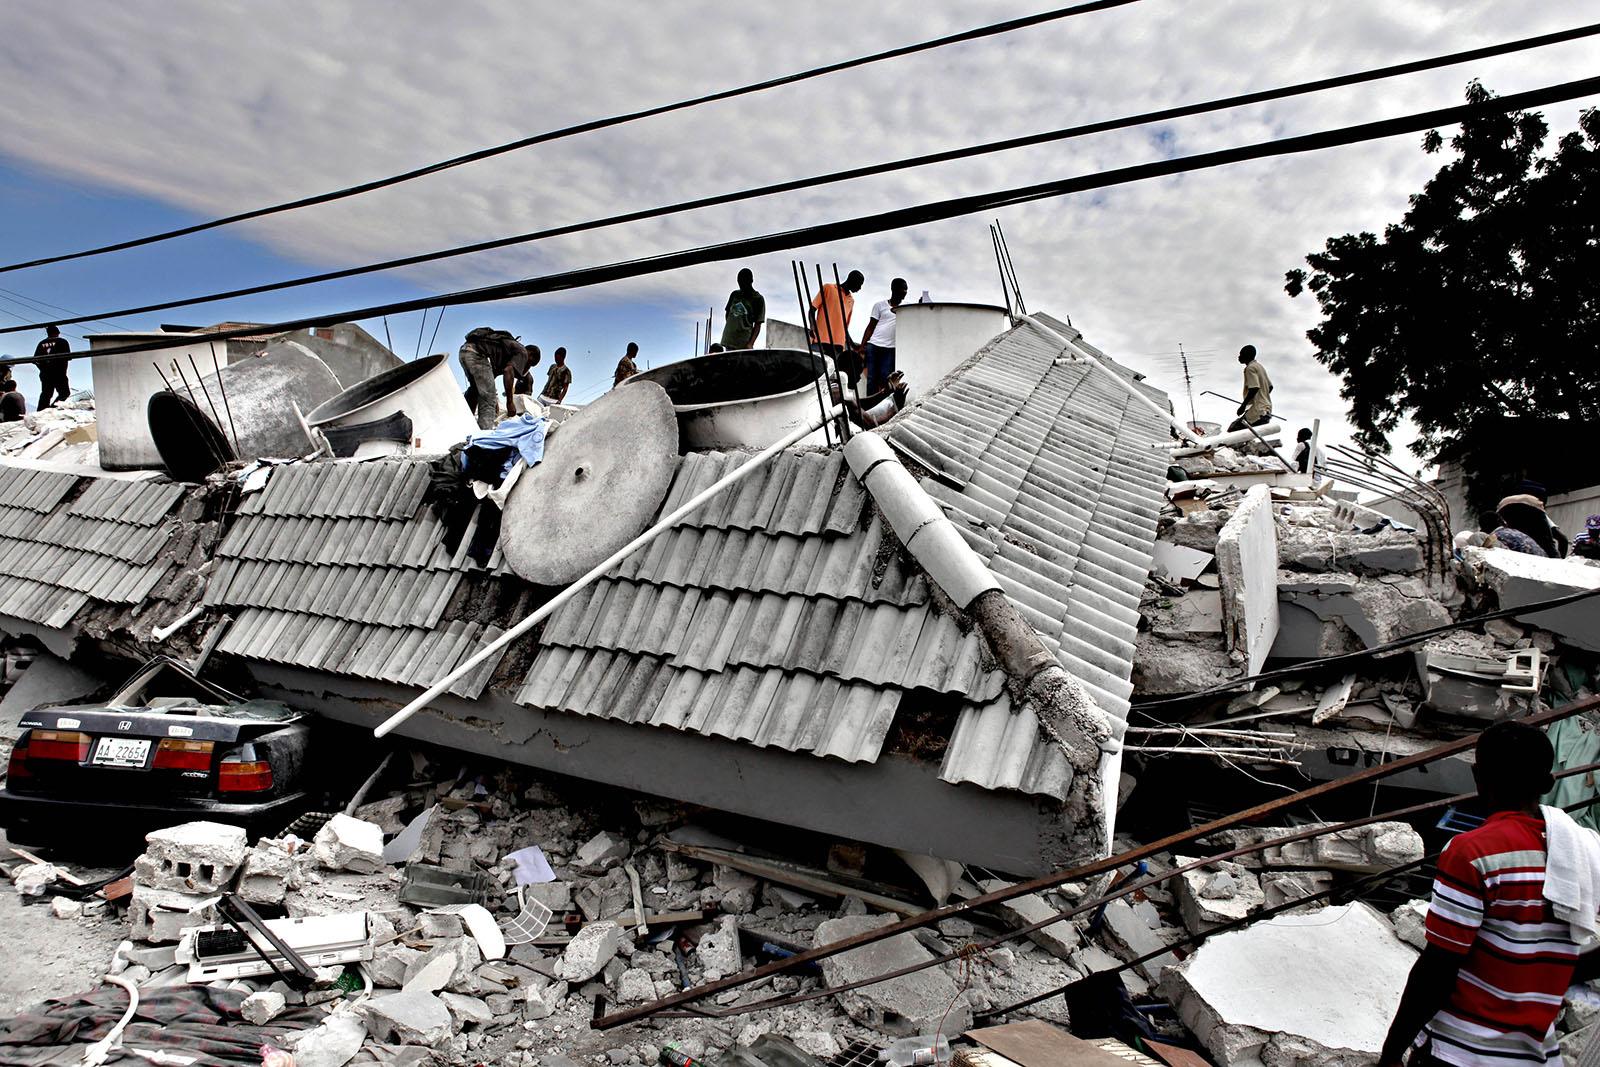 The earthquake in Haiti in January 2010 killed over 200,000 people.